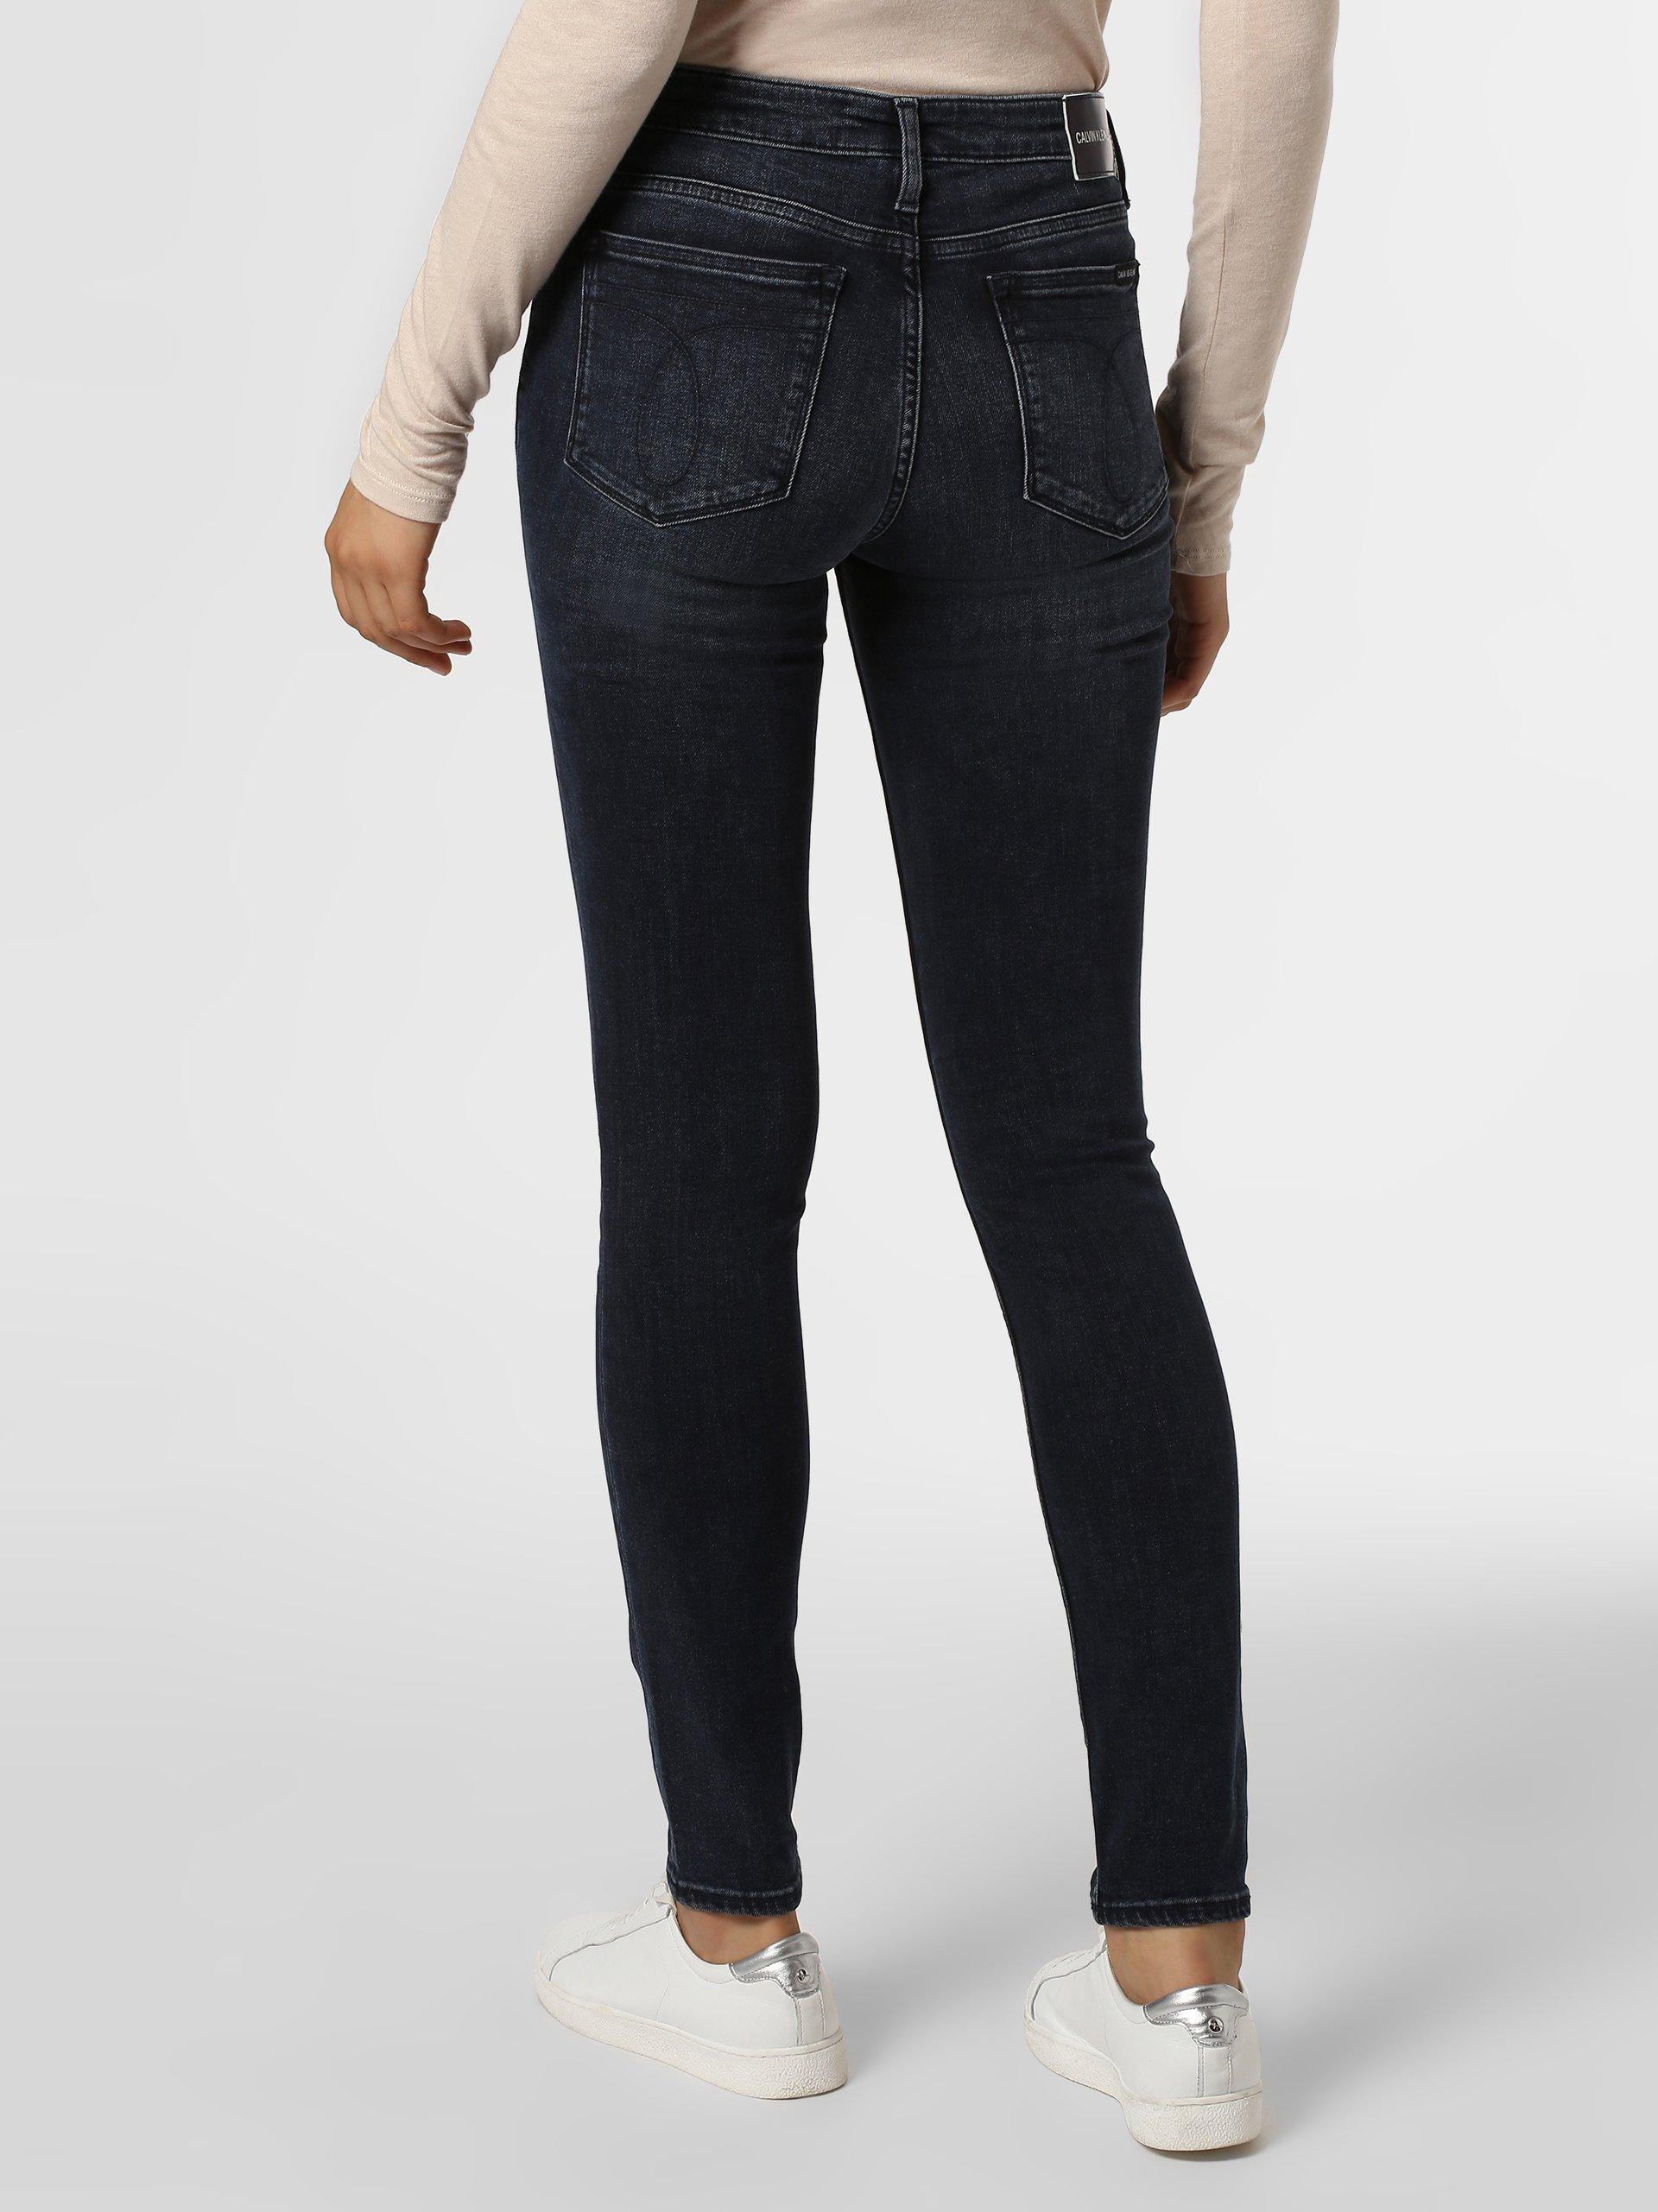 Calvin Klein Jeans Damen Jeans